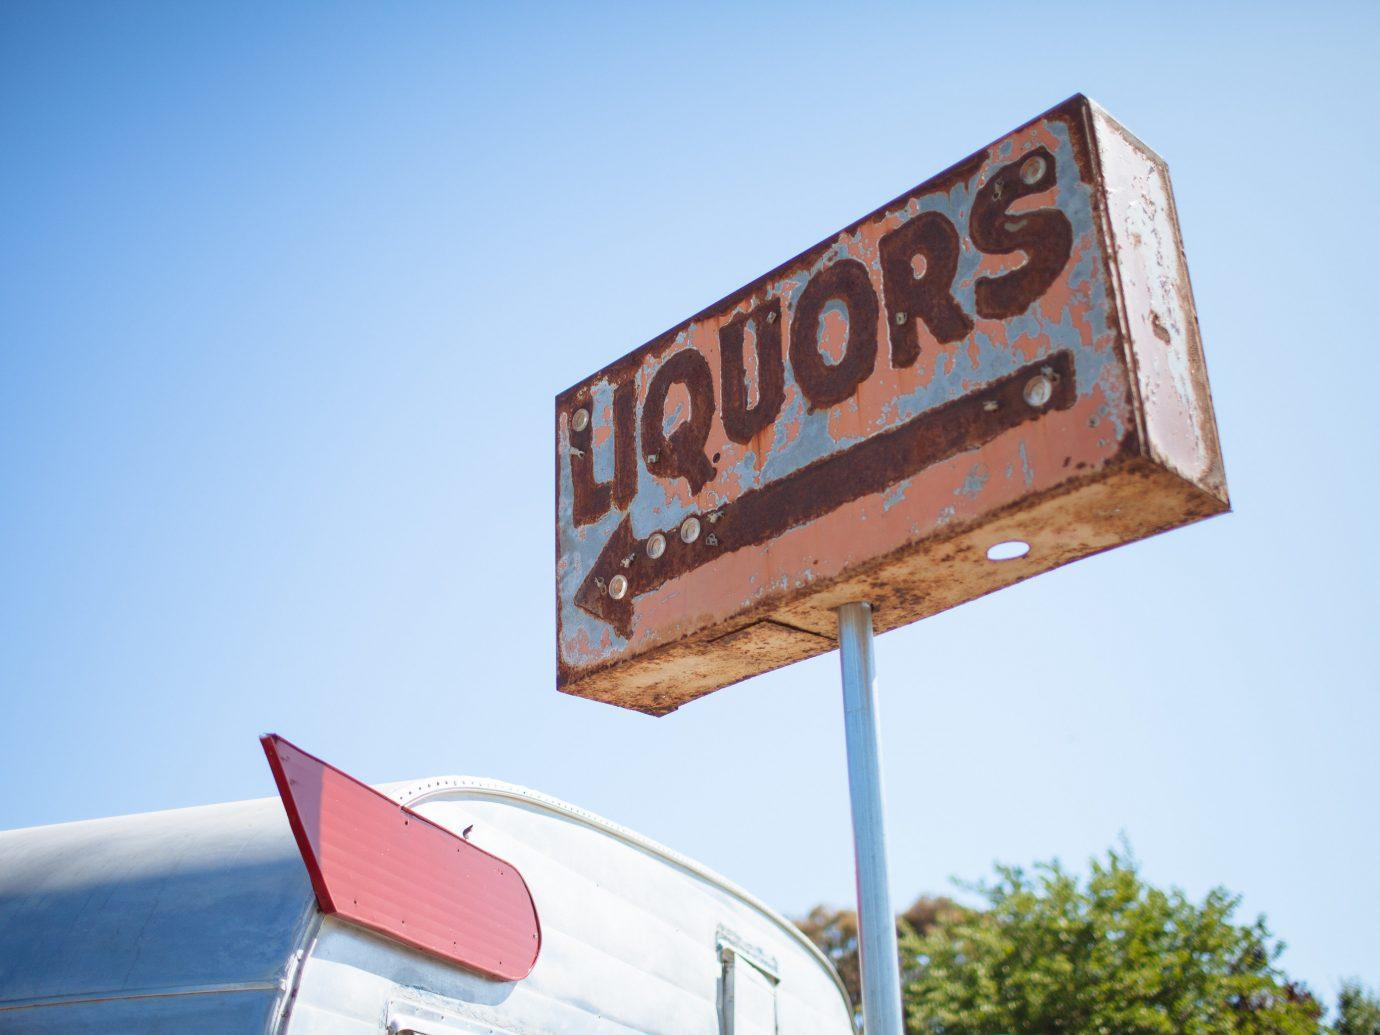 Food + Drink Girls Getaways Trip Ideas Weekend Getaways sky outdoor sign blue text advertising street sign signage traffic sign billboard